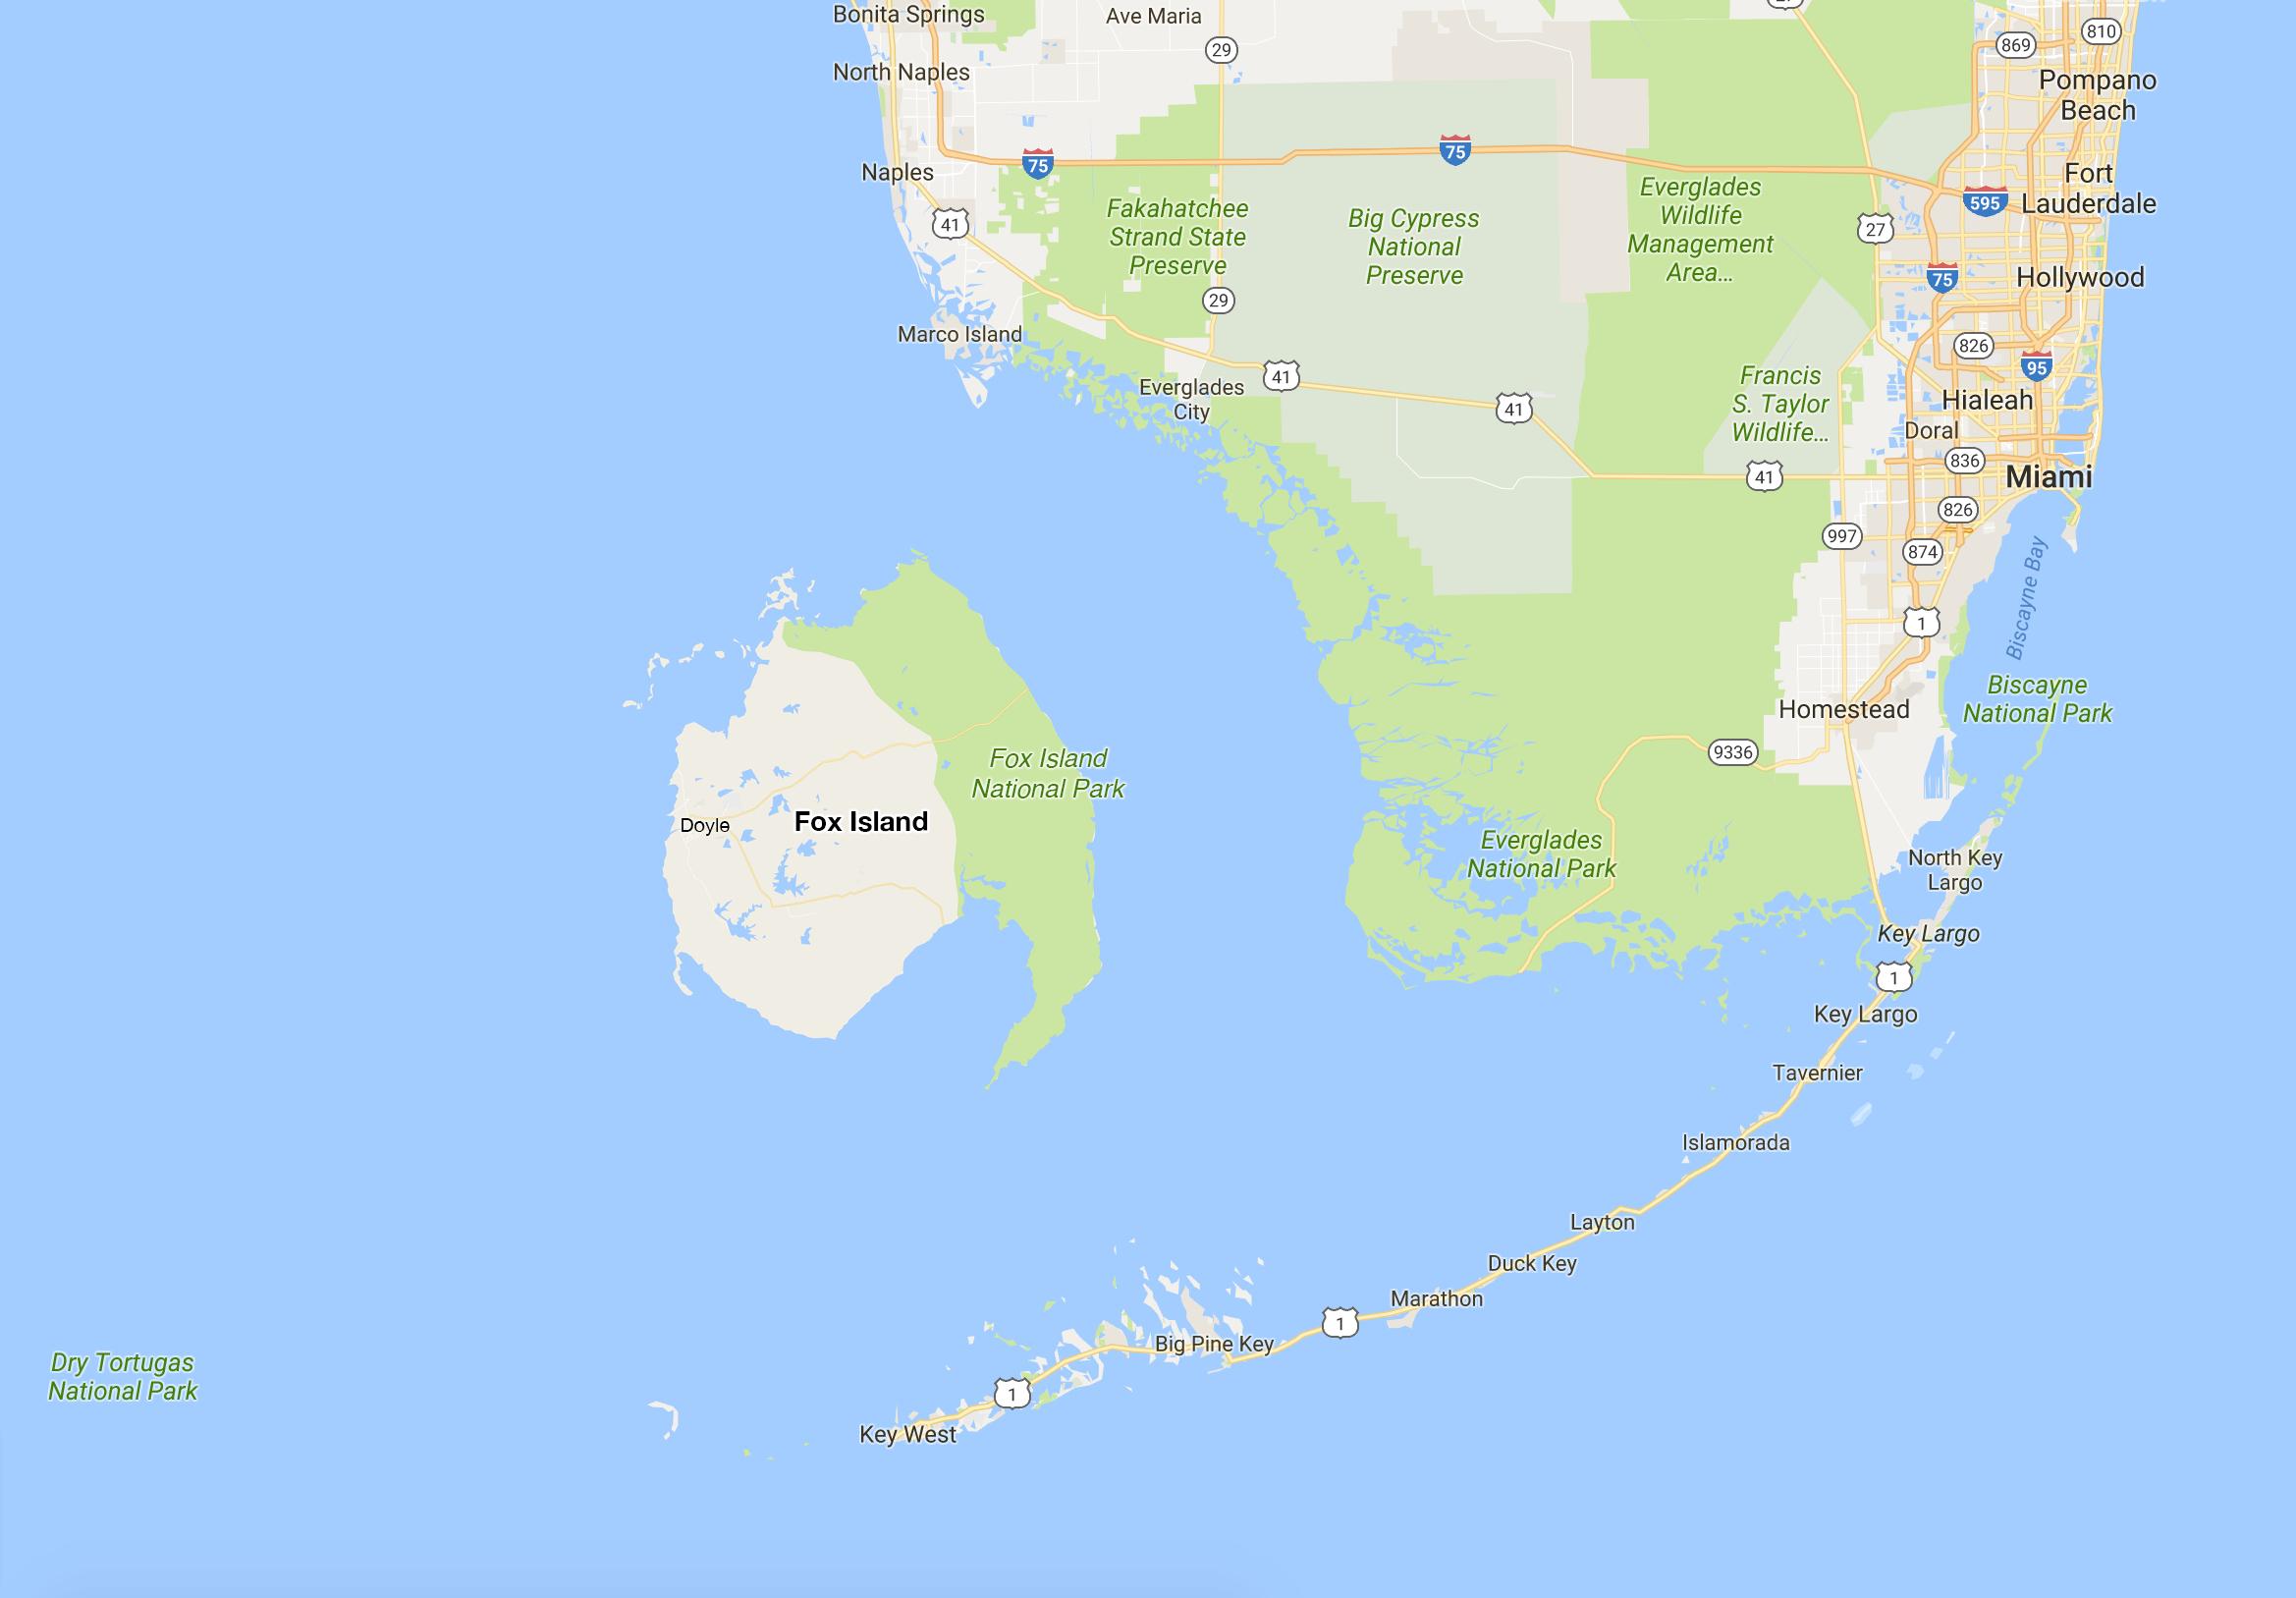 Imaginary Island Off The Coast Of Southern Florida : Imaginarymaps - Map Of Islands Off The Coast Of Florida